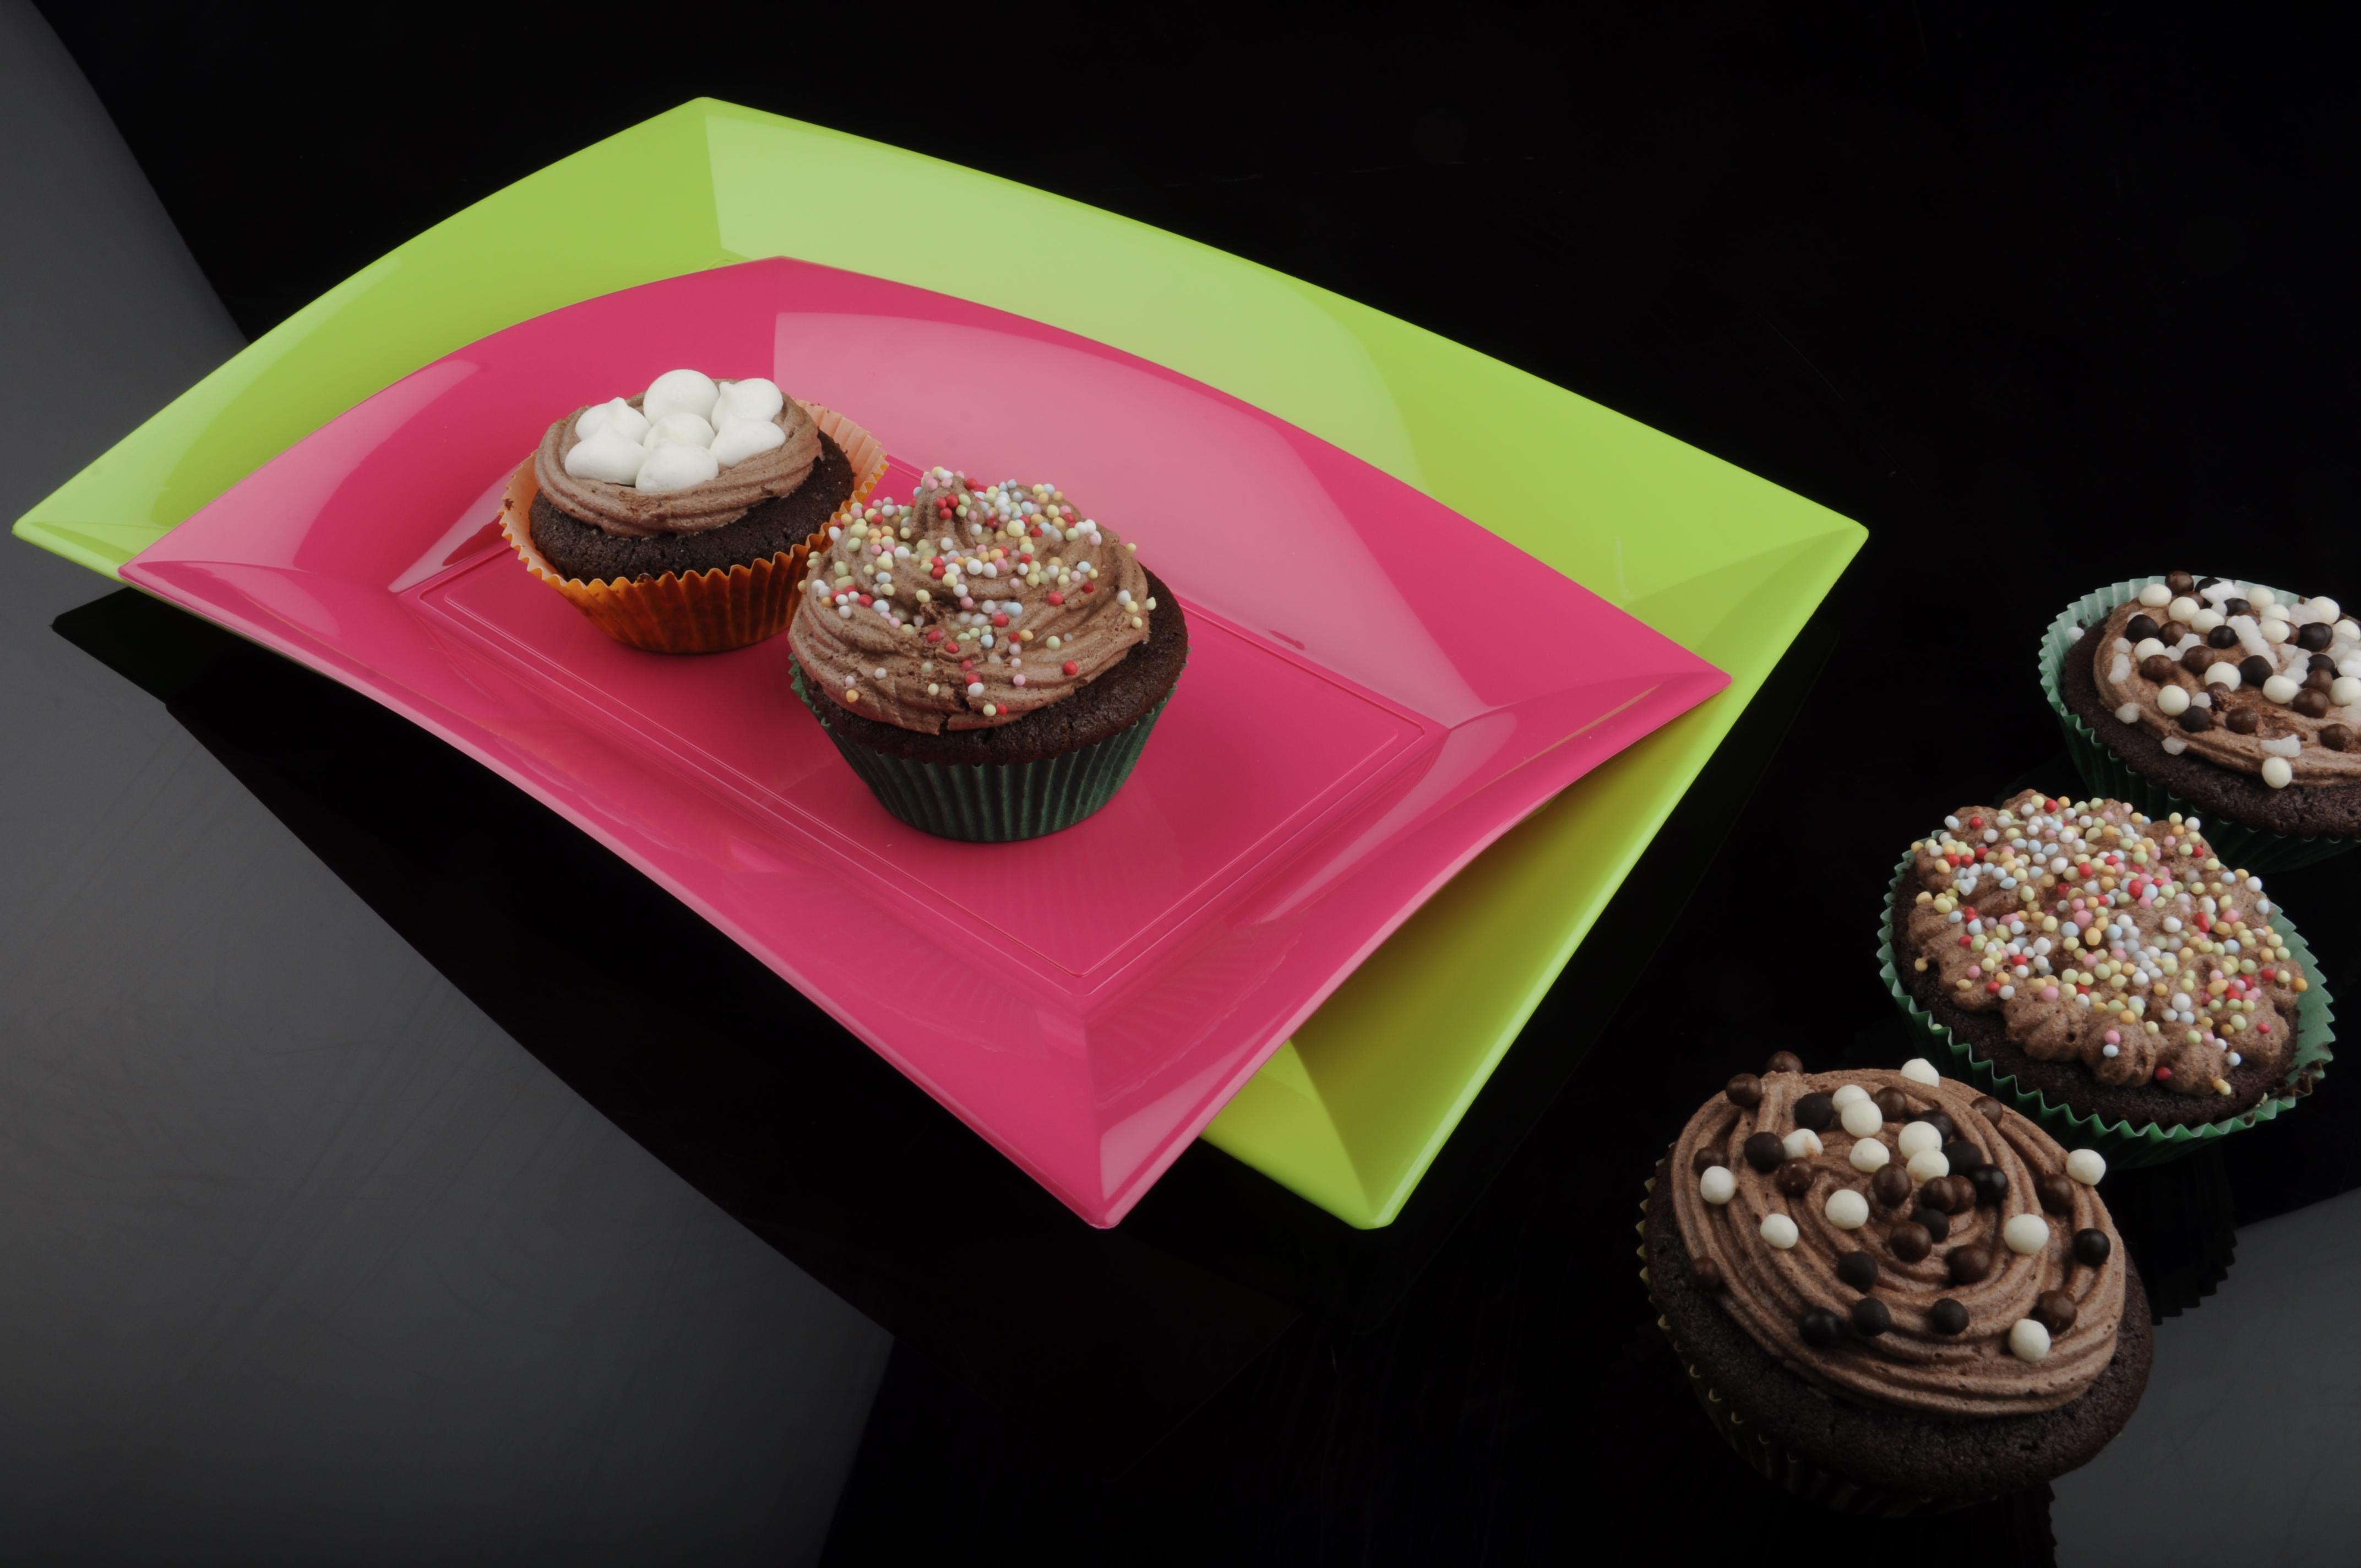 ricette torta cioccolato vittoria inghilterra. Black Bedroom Furniture Sets. Home Design Ideas